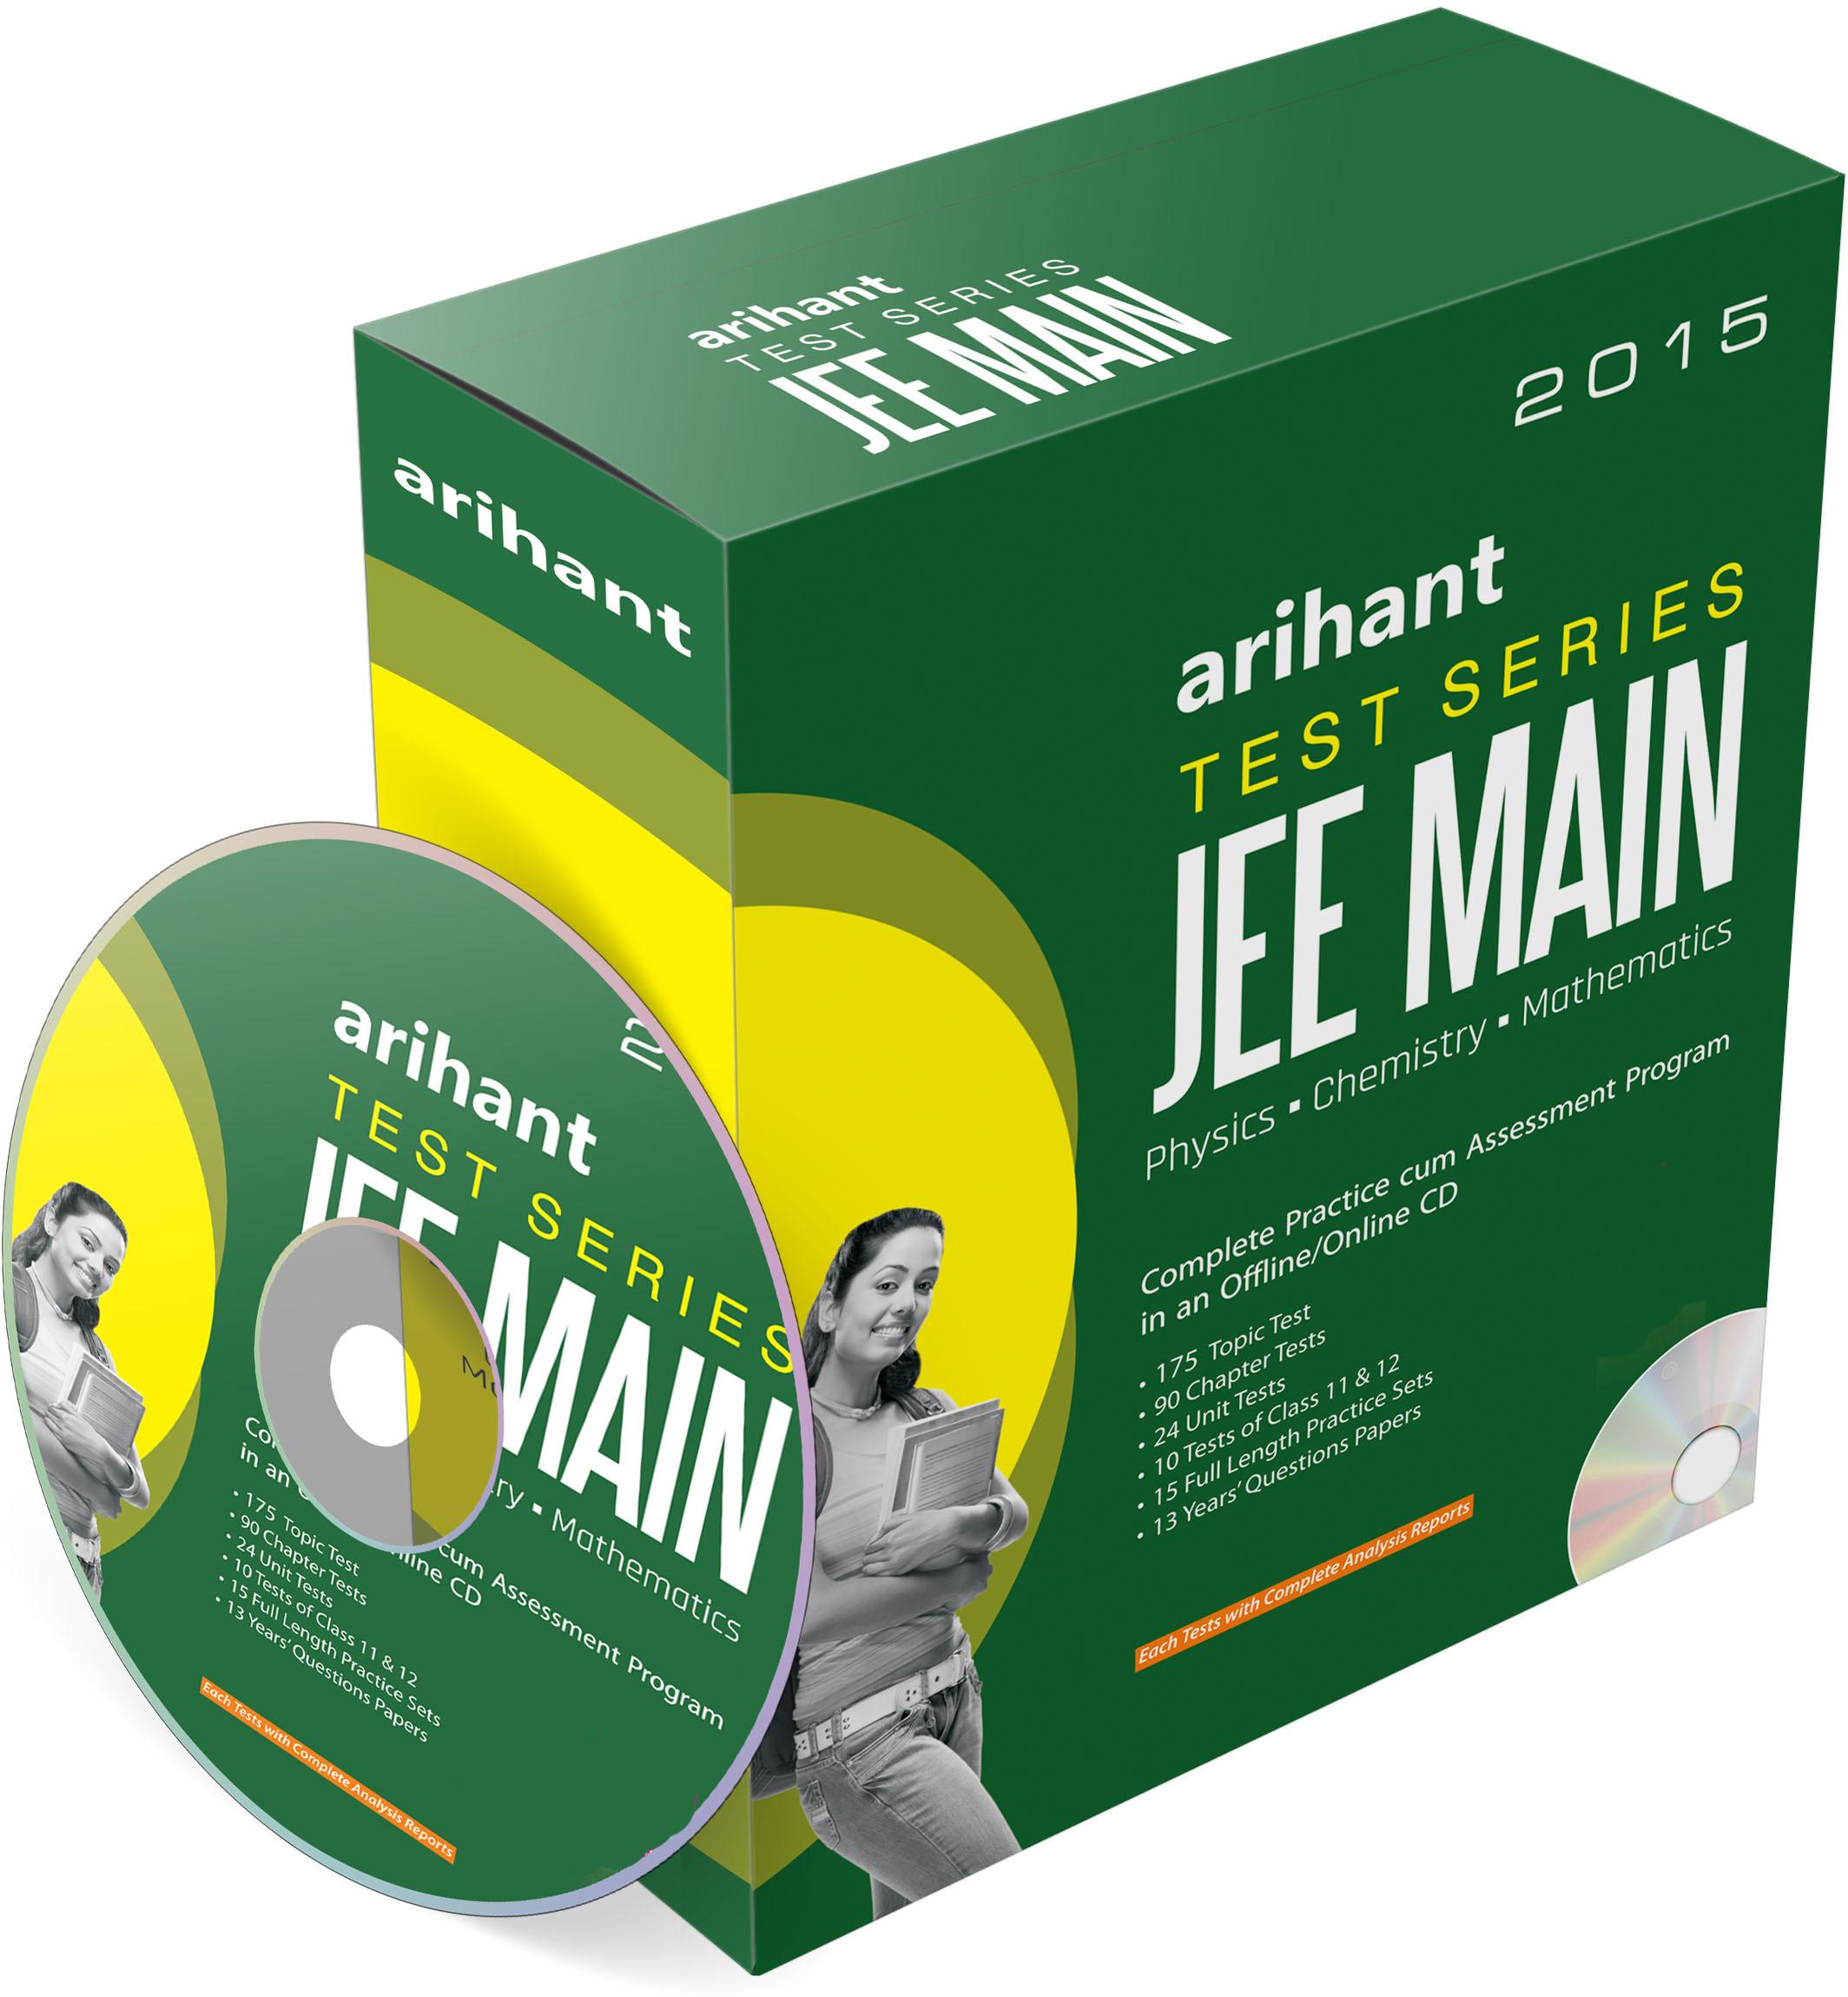 Arihant Test Series JEE Main - 2015(CD)